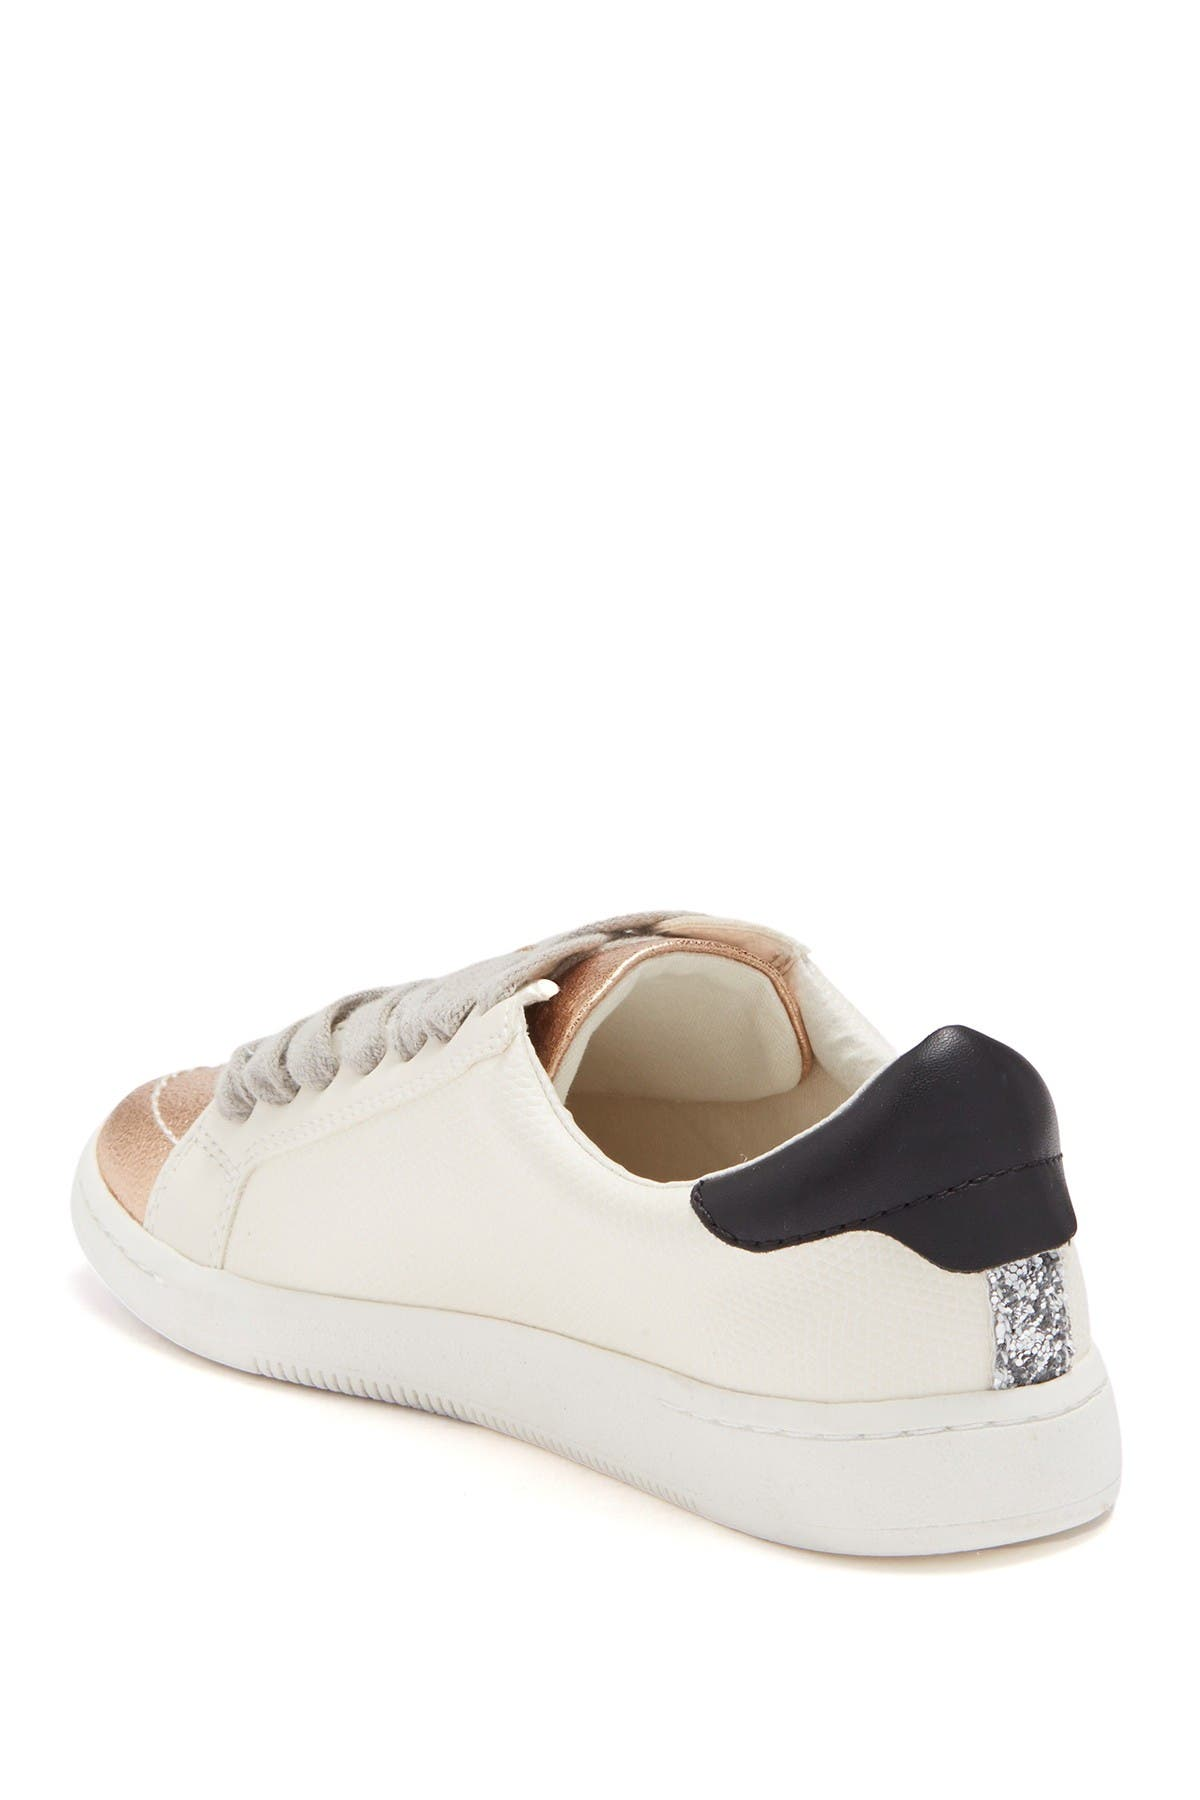 Image of Dolce Vita Nadea Sneaker